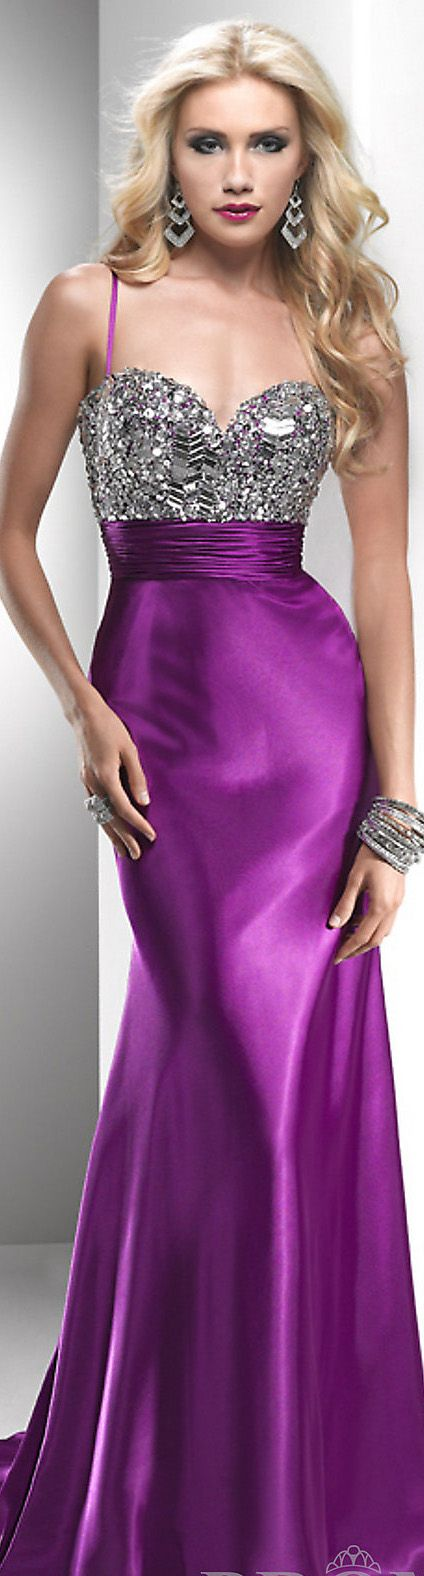 VIOLETA Y PLATEADO....❤ | Mujer - trajes fiesta | Pinterest ...